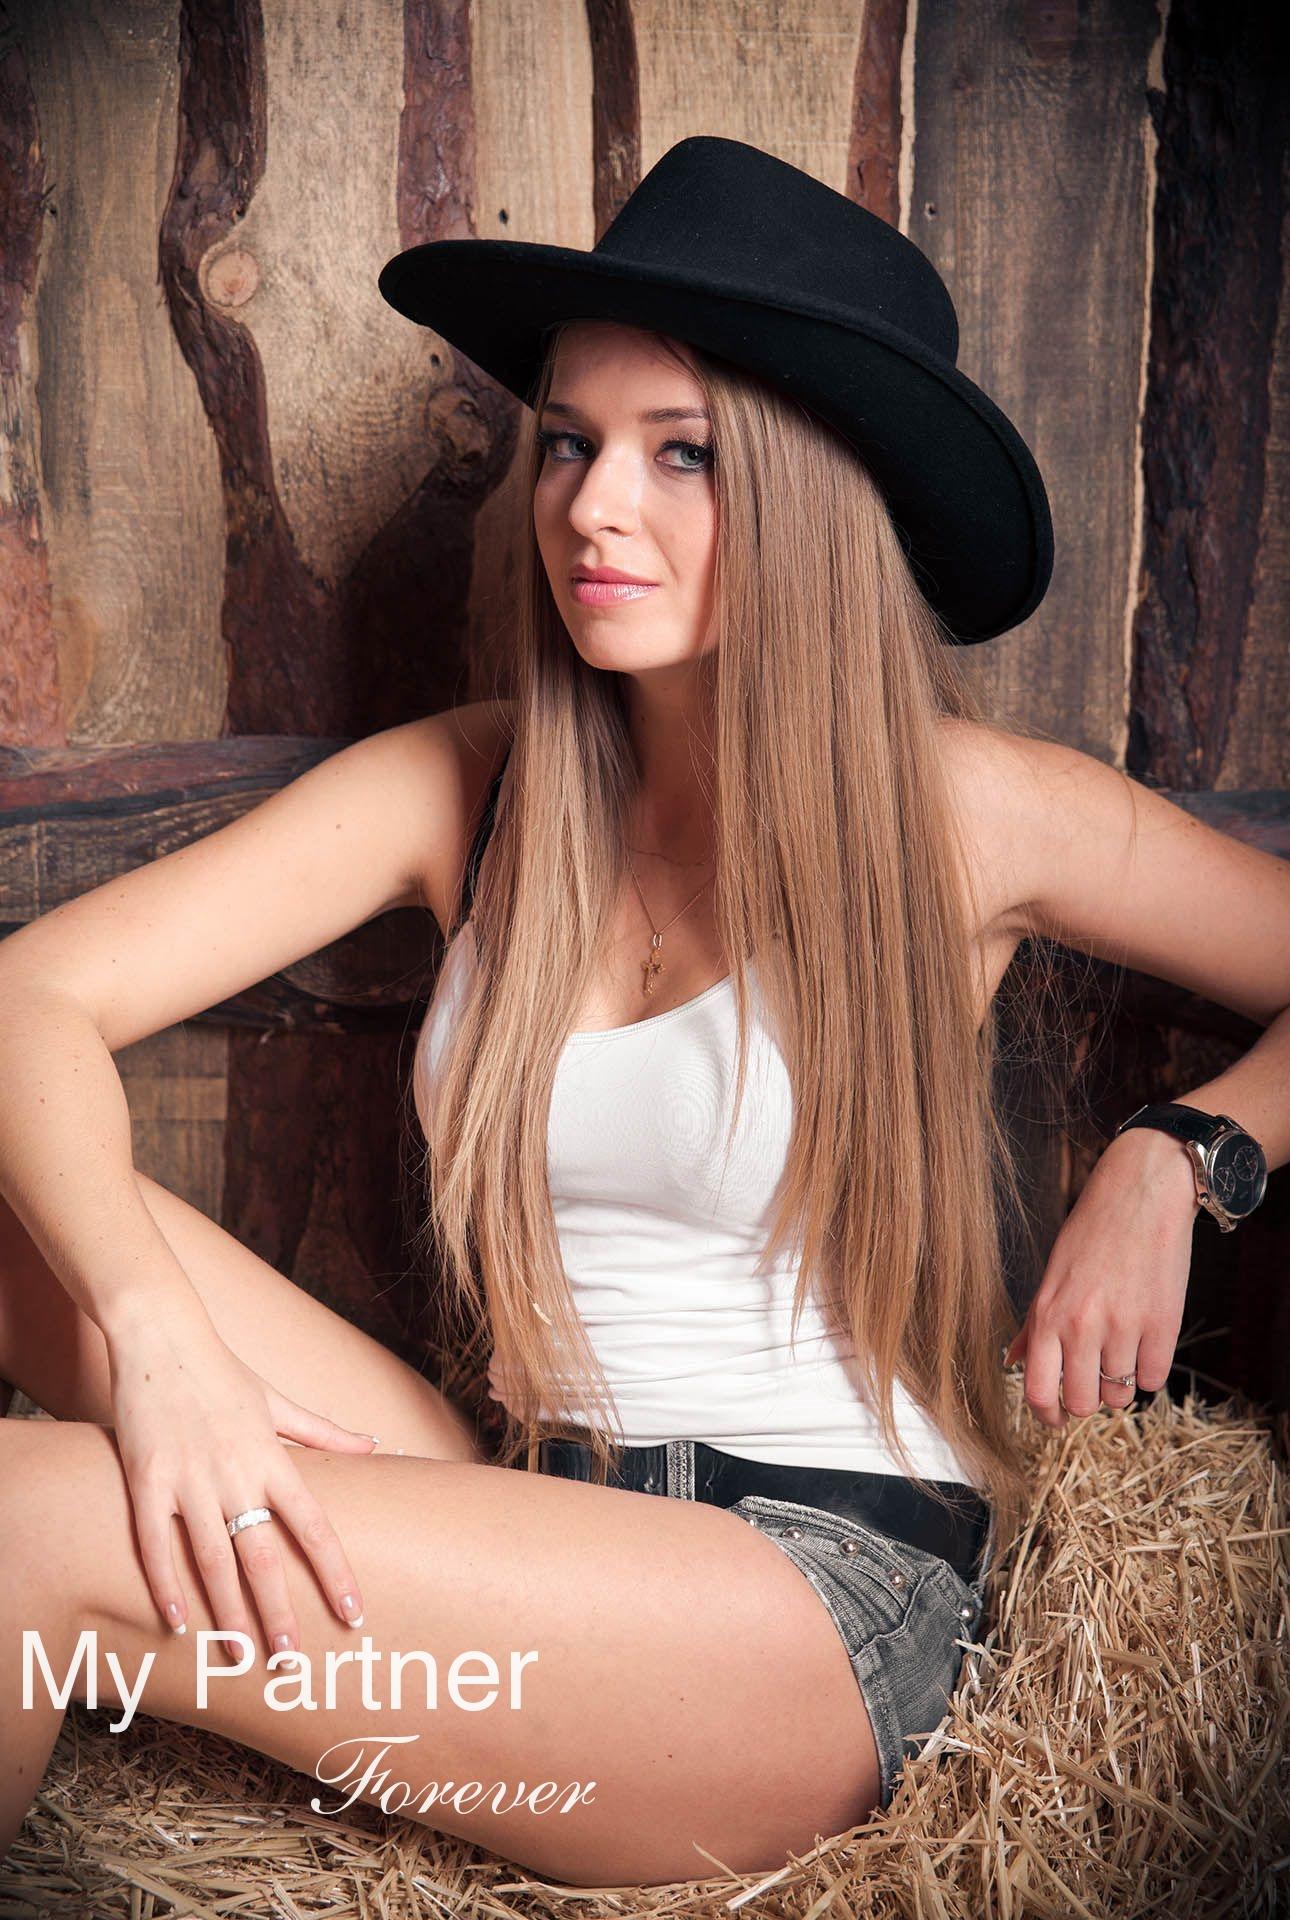 Dating Site to Meet Single Ukrainian Girl Nadezhda from Zaporozhye, Ukraine